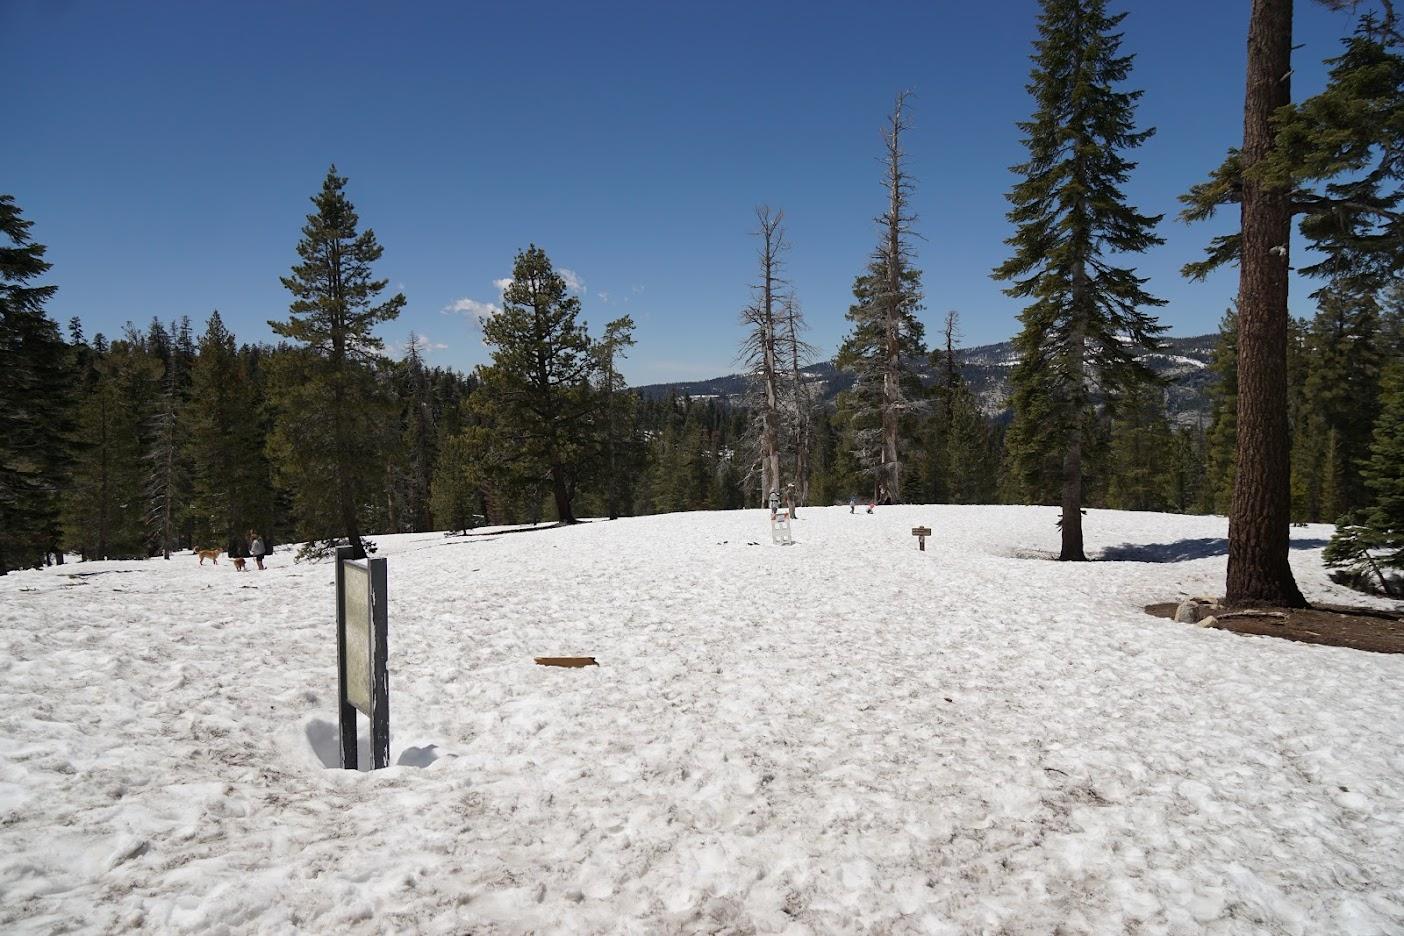 Yosemite snow fall